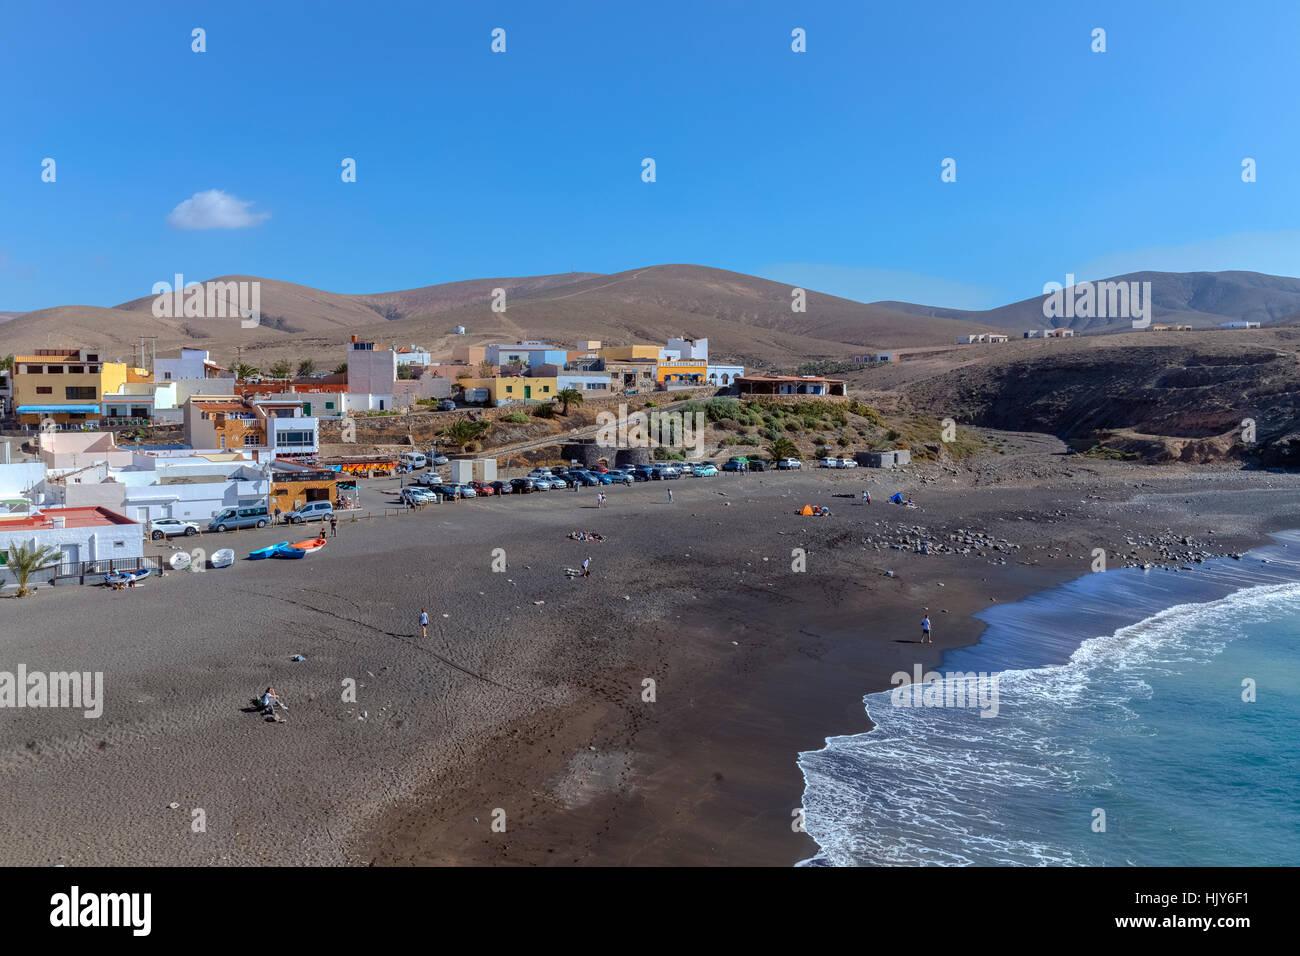 Ajuy, Pajara, Fuerteventura, Kanarische Inseln, Spanien Stockbild